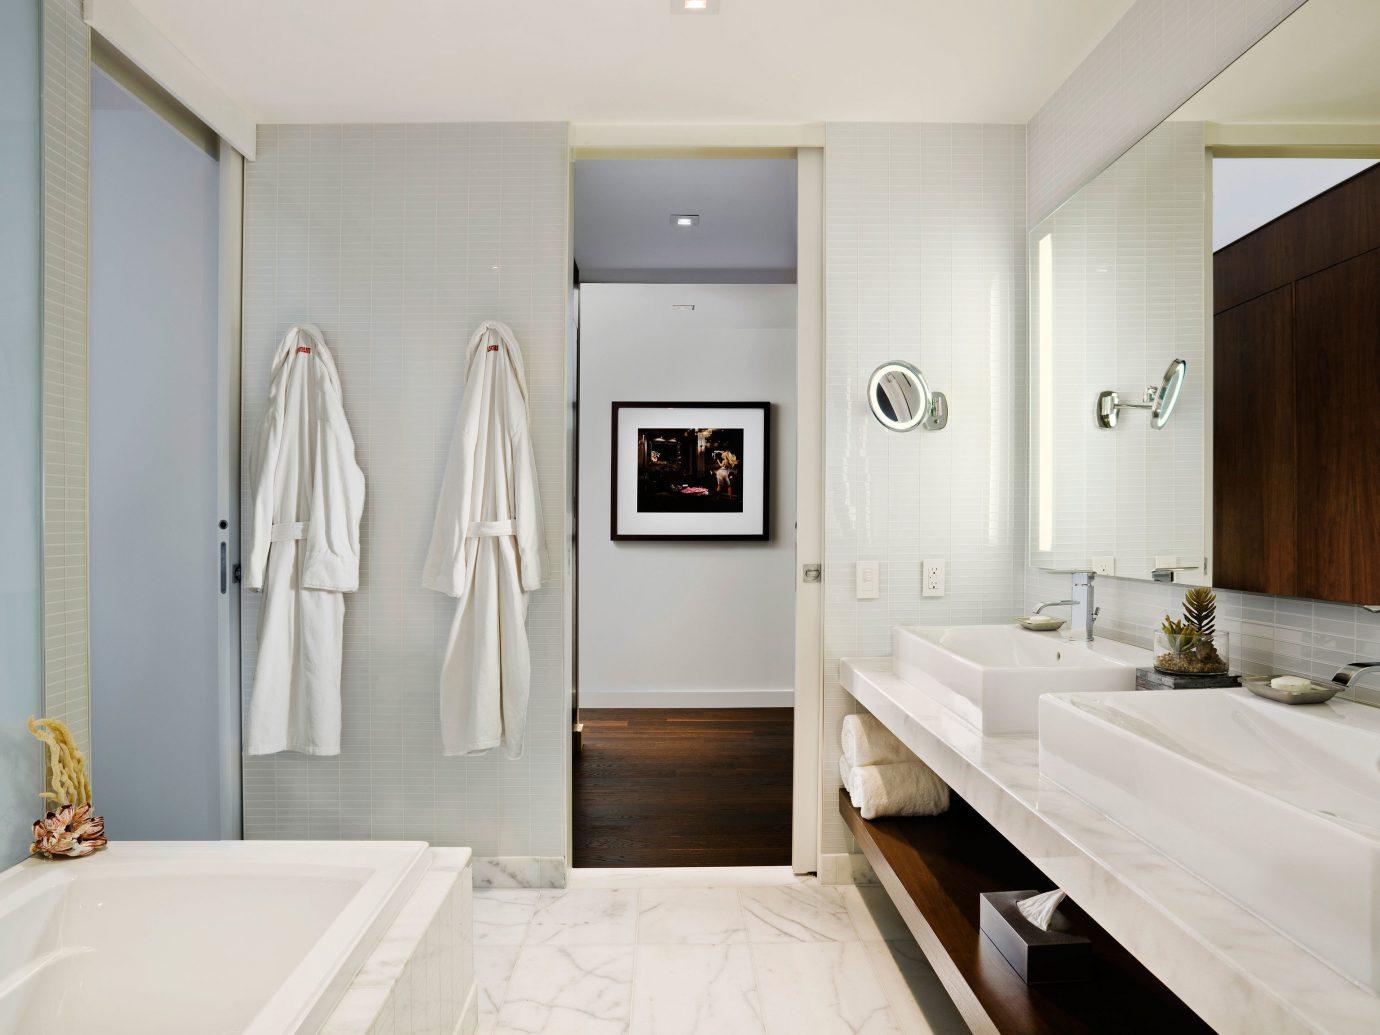 Canada Hotels Toronto wall indoor bathroom floor room property ceiling Suite home interior design sink real estate estate Design apartment cabinetry flooring tub clean Bath bathtub